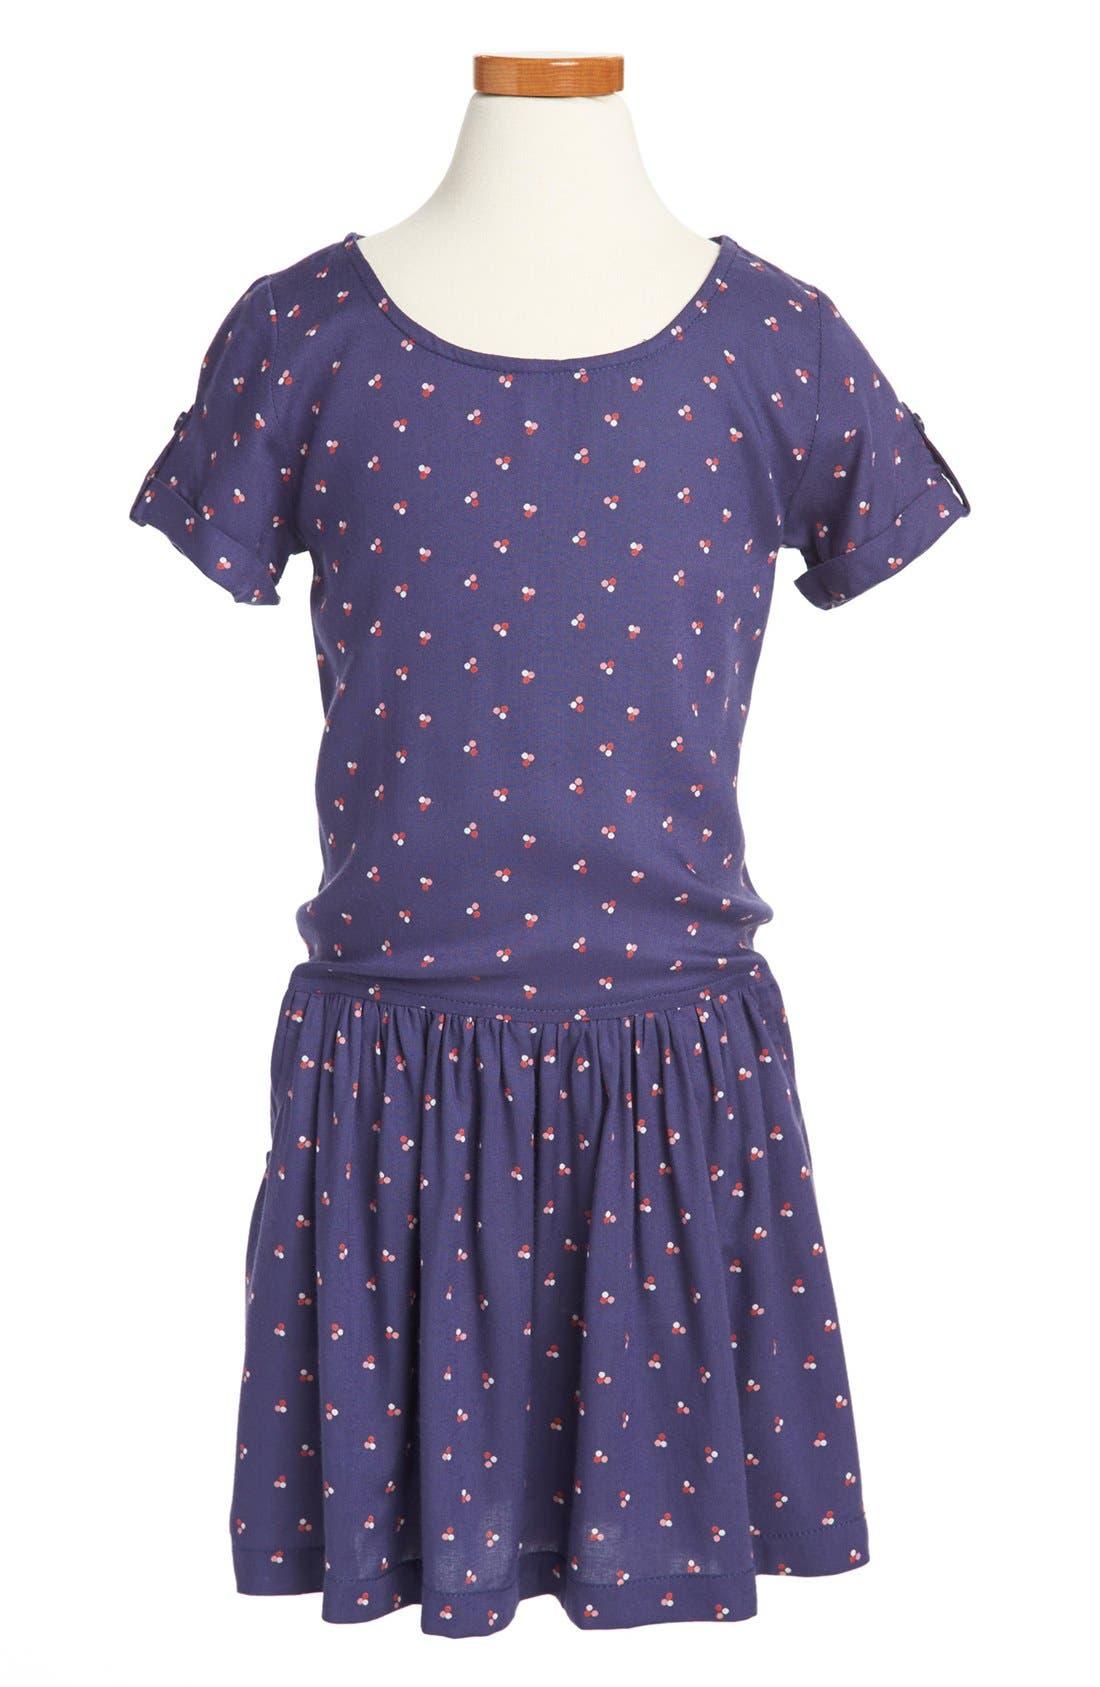 Alternate Image 1 Selected - Tucker + Tate 'Jules' Dress (Little Girls & Big Girls)